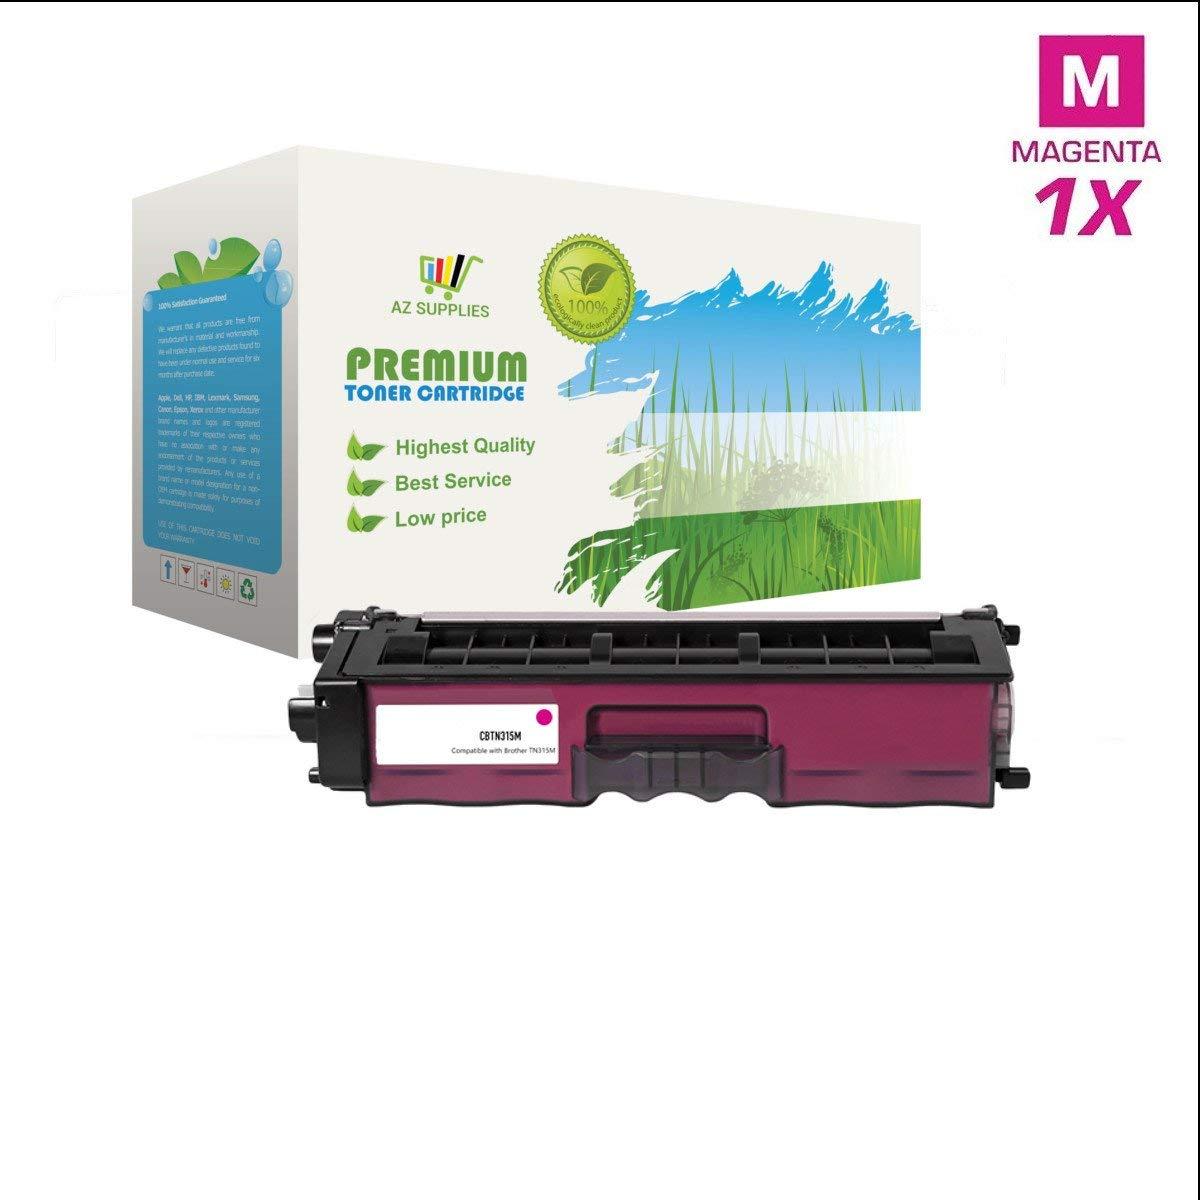 AZ Supplies © Premium OEM Quality TN315 Magenta Toner Cartridge Professionally Remanufactured for DCP-9055, DCP-9055CDN, HL-4150CDN, HL-4570CDW, HL-4570CDWT, MFC-9460CDN, MFC-9560CDW, MFC-9970CDW Magenta: 3500 page yield.